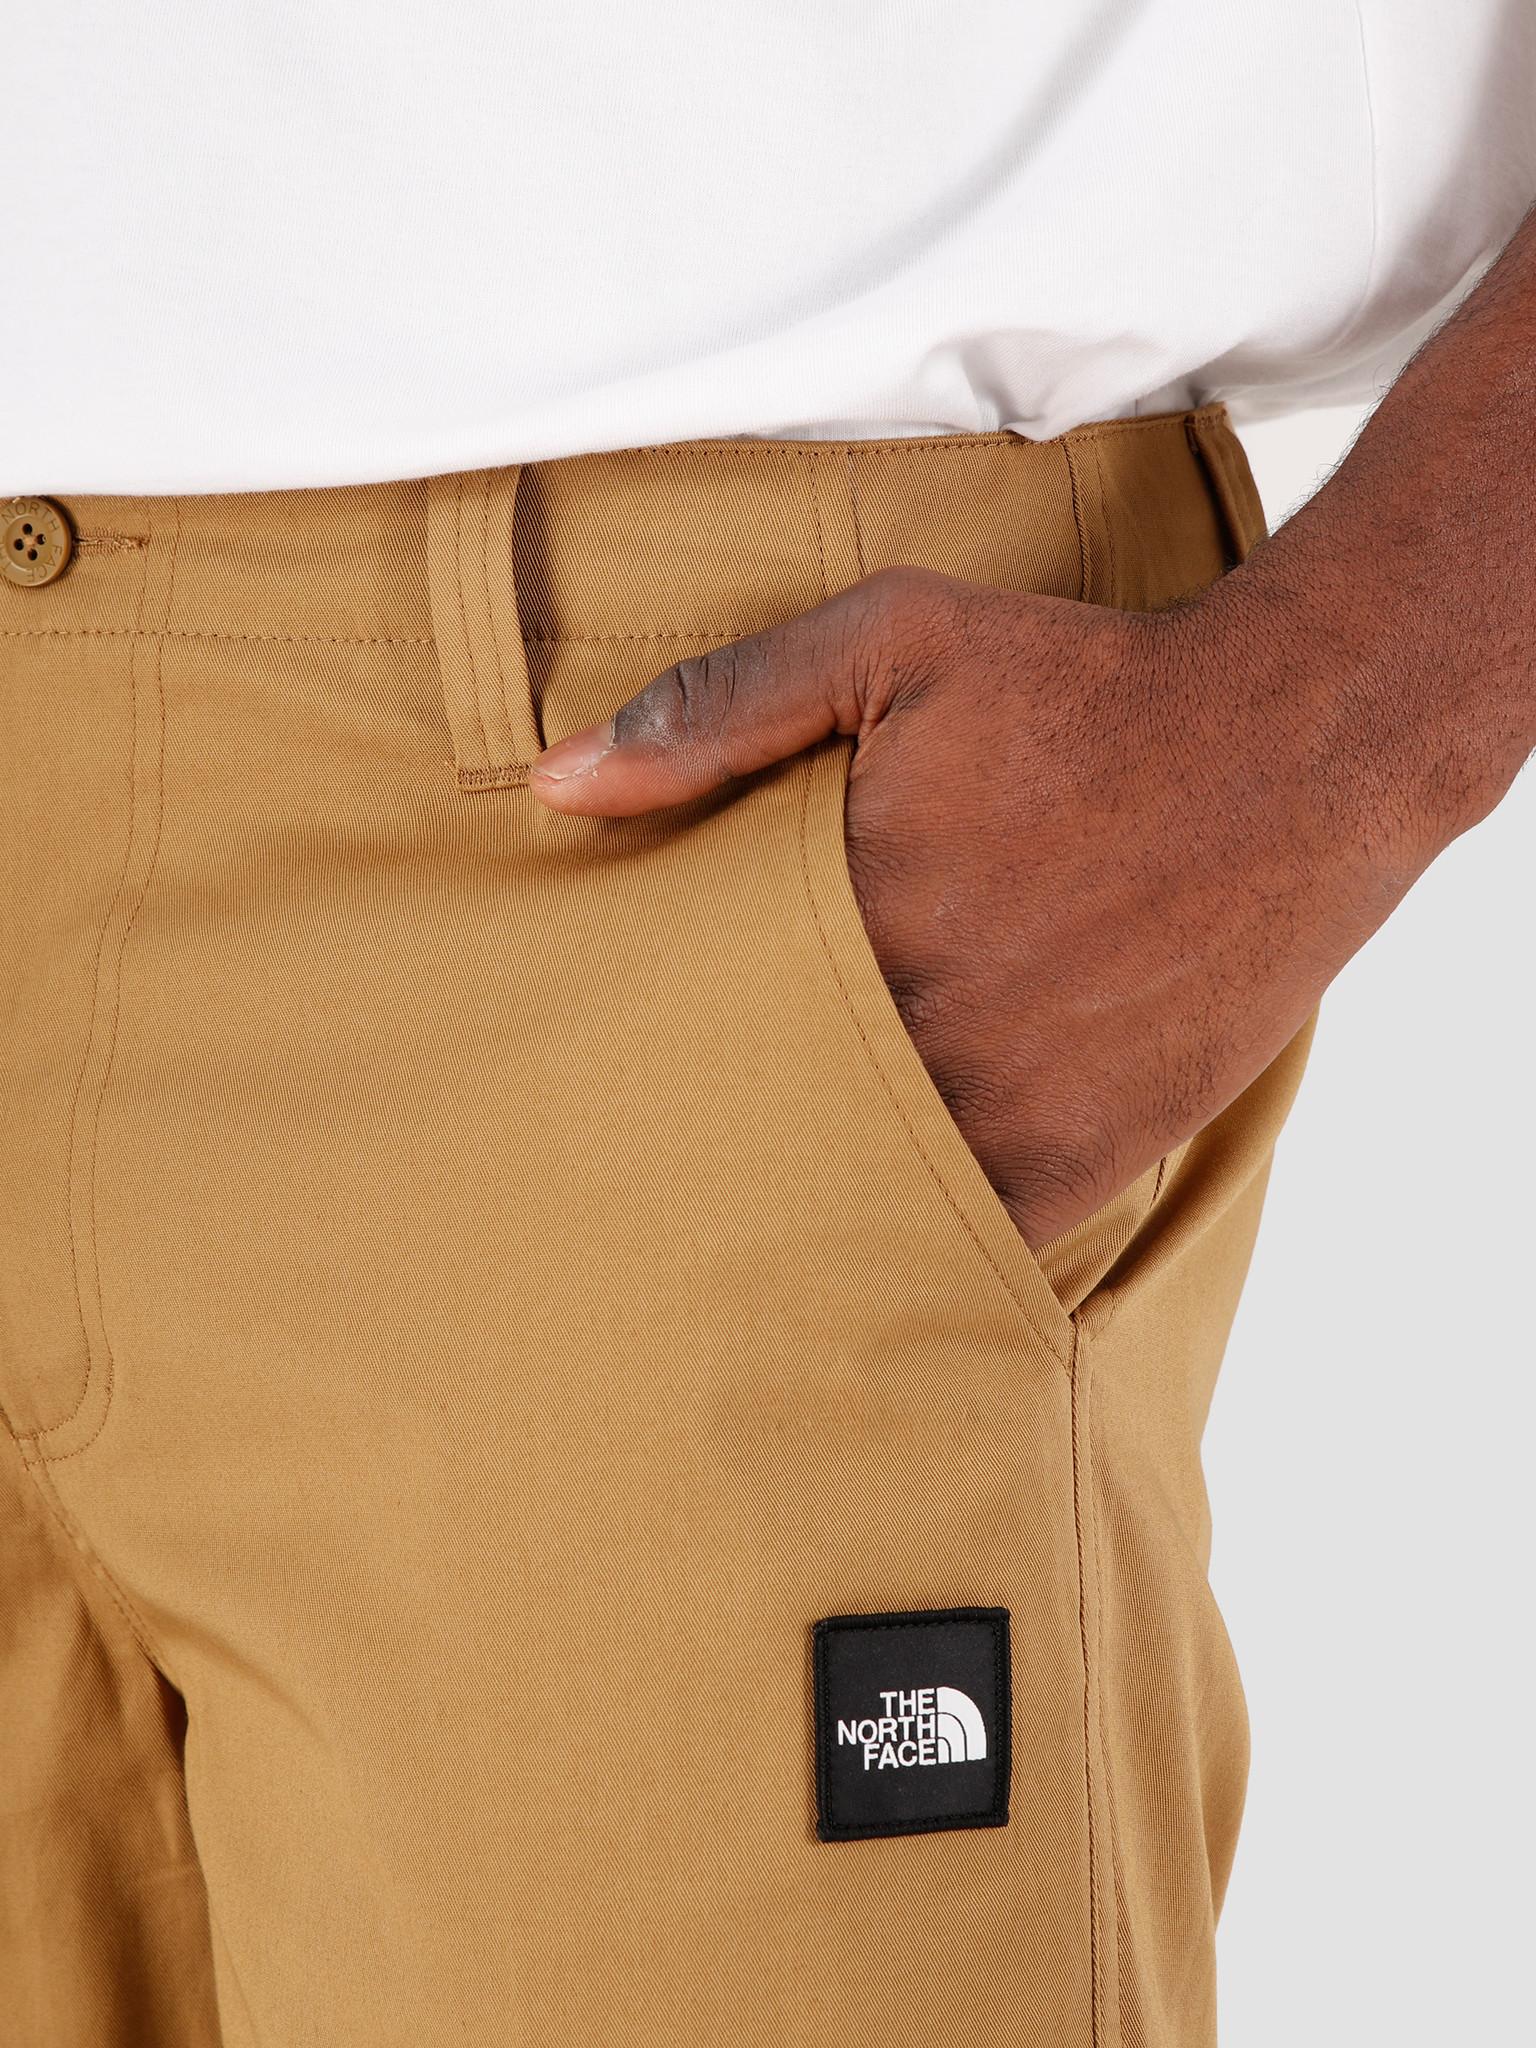 The North Face The North Face Side Slack Pant British Khaki NF0A4C9LD9V1